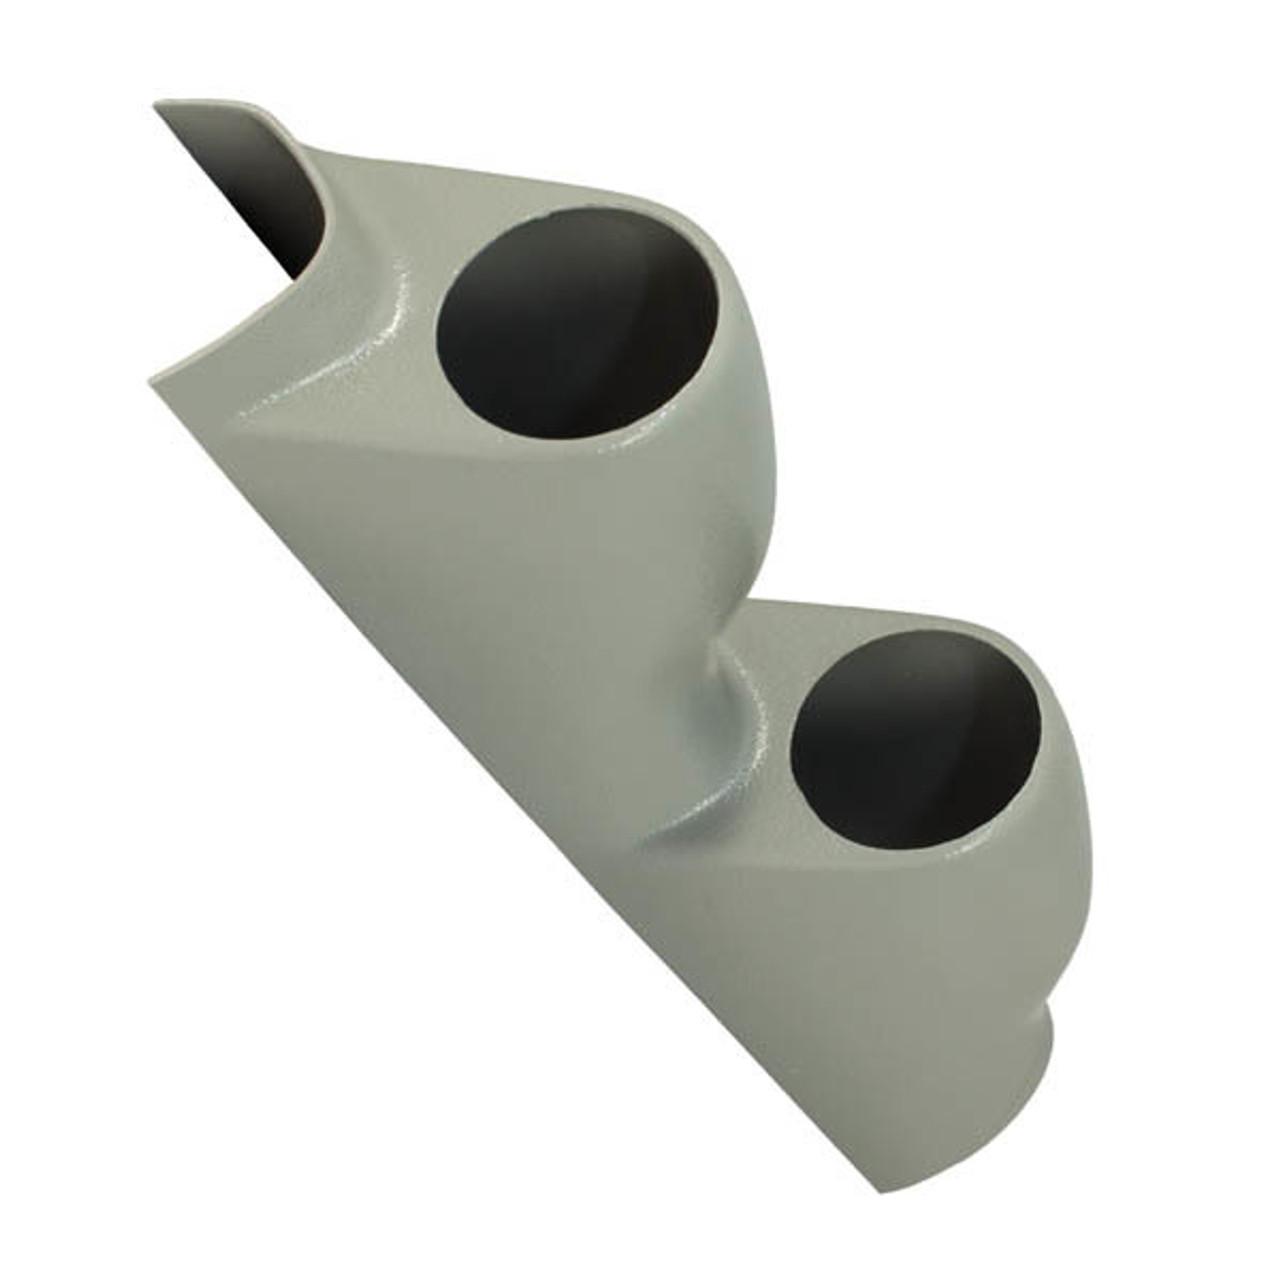 GlowShift Black Dual Pillar Gauge Pod for 1994-2001 Acura Integra ABS Plastic 2 Gauges to Vehicles A-Pillar 2-1//16 52mm Mounts